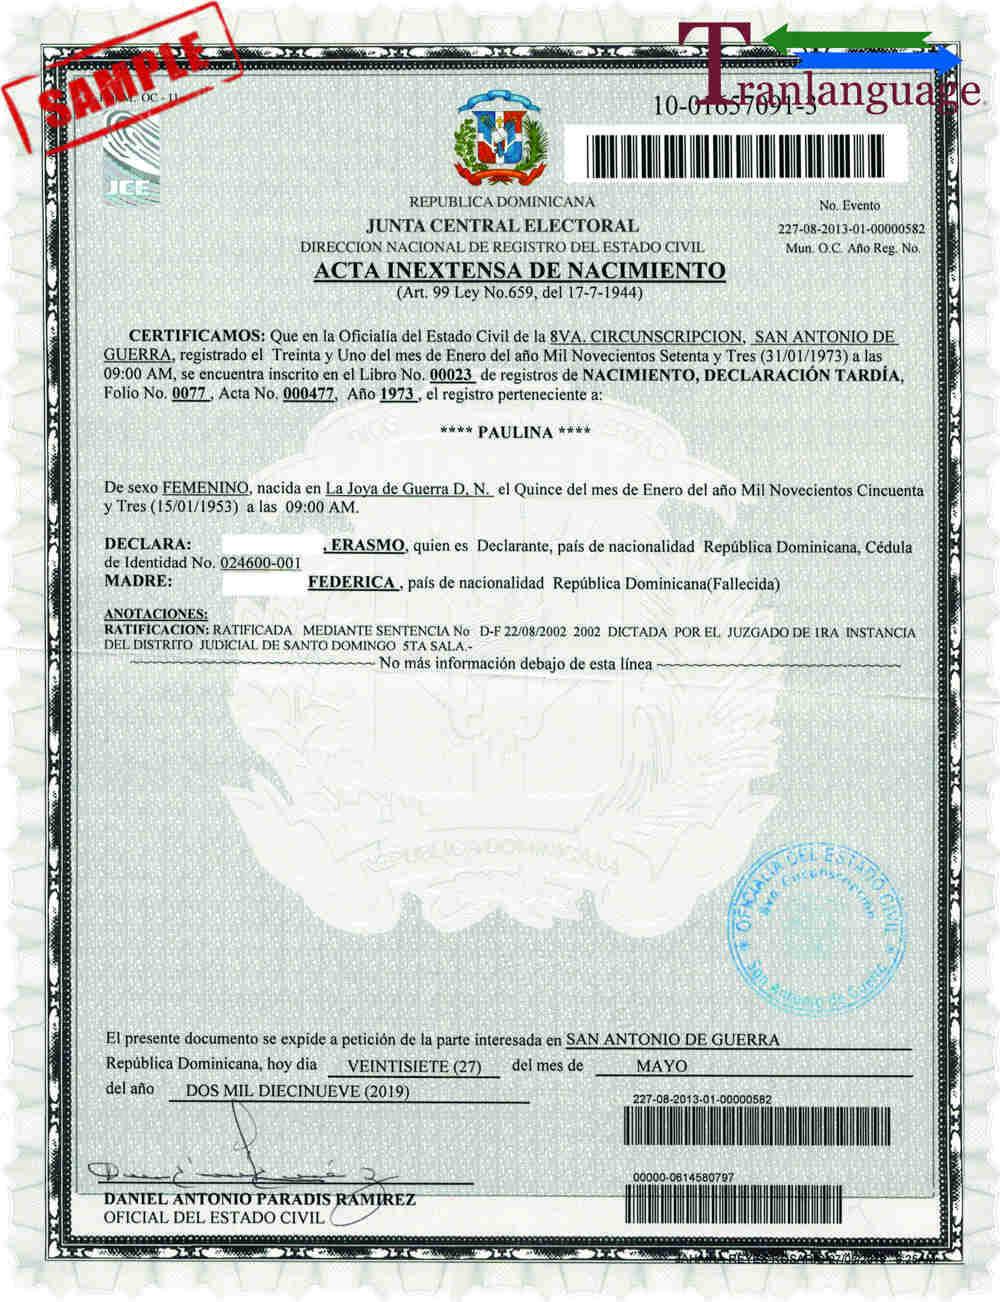 certificate birth dominican translation republic template spanish certified regarding example tranlanguage document translated translate antonio